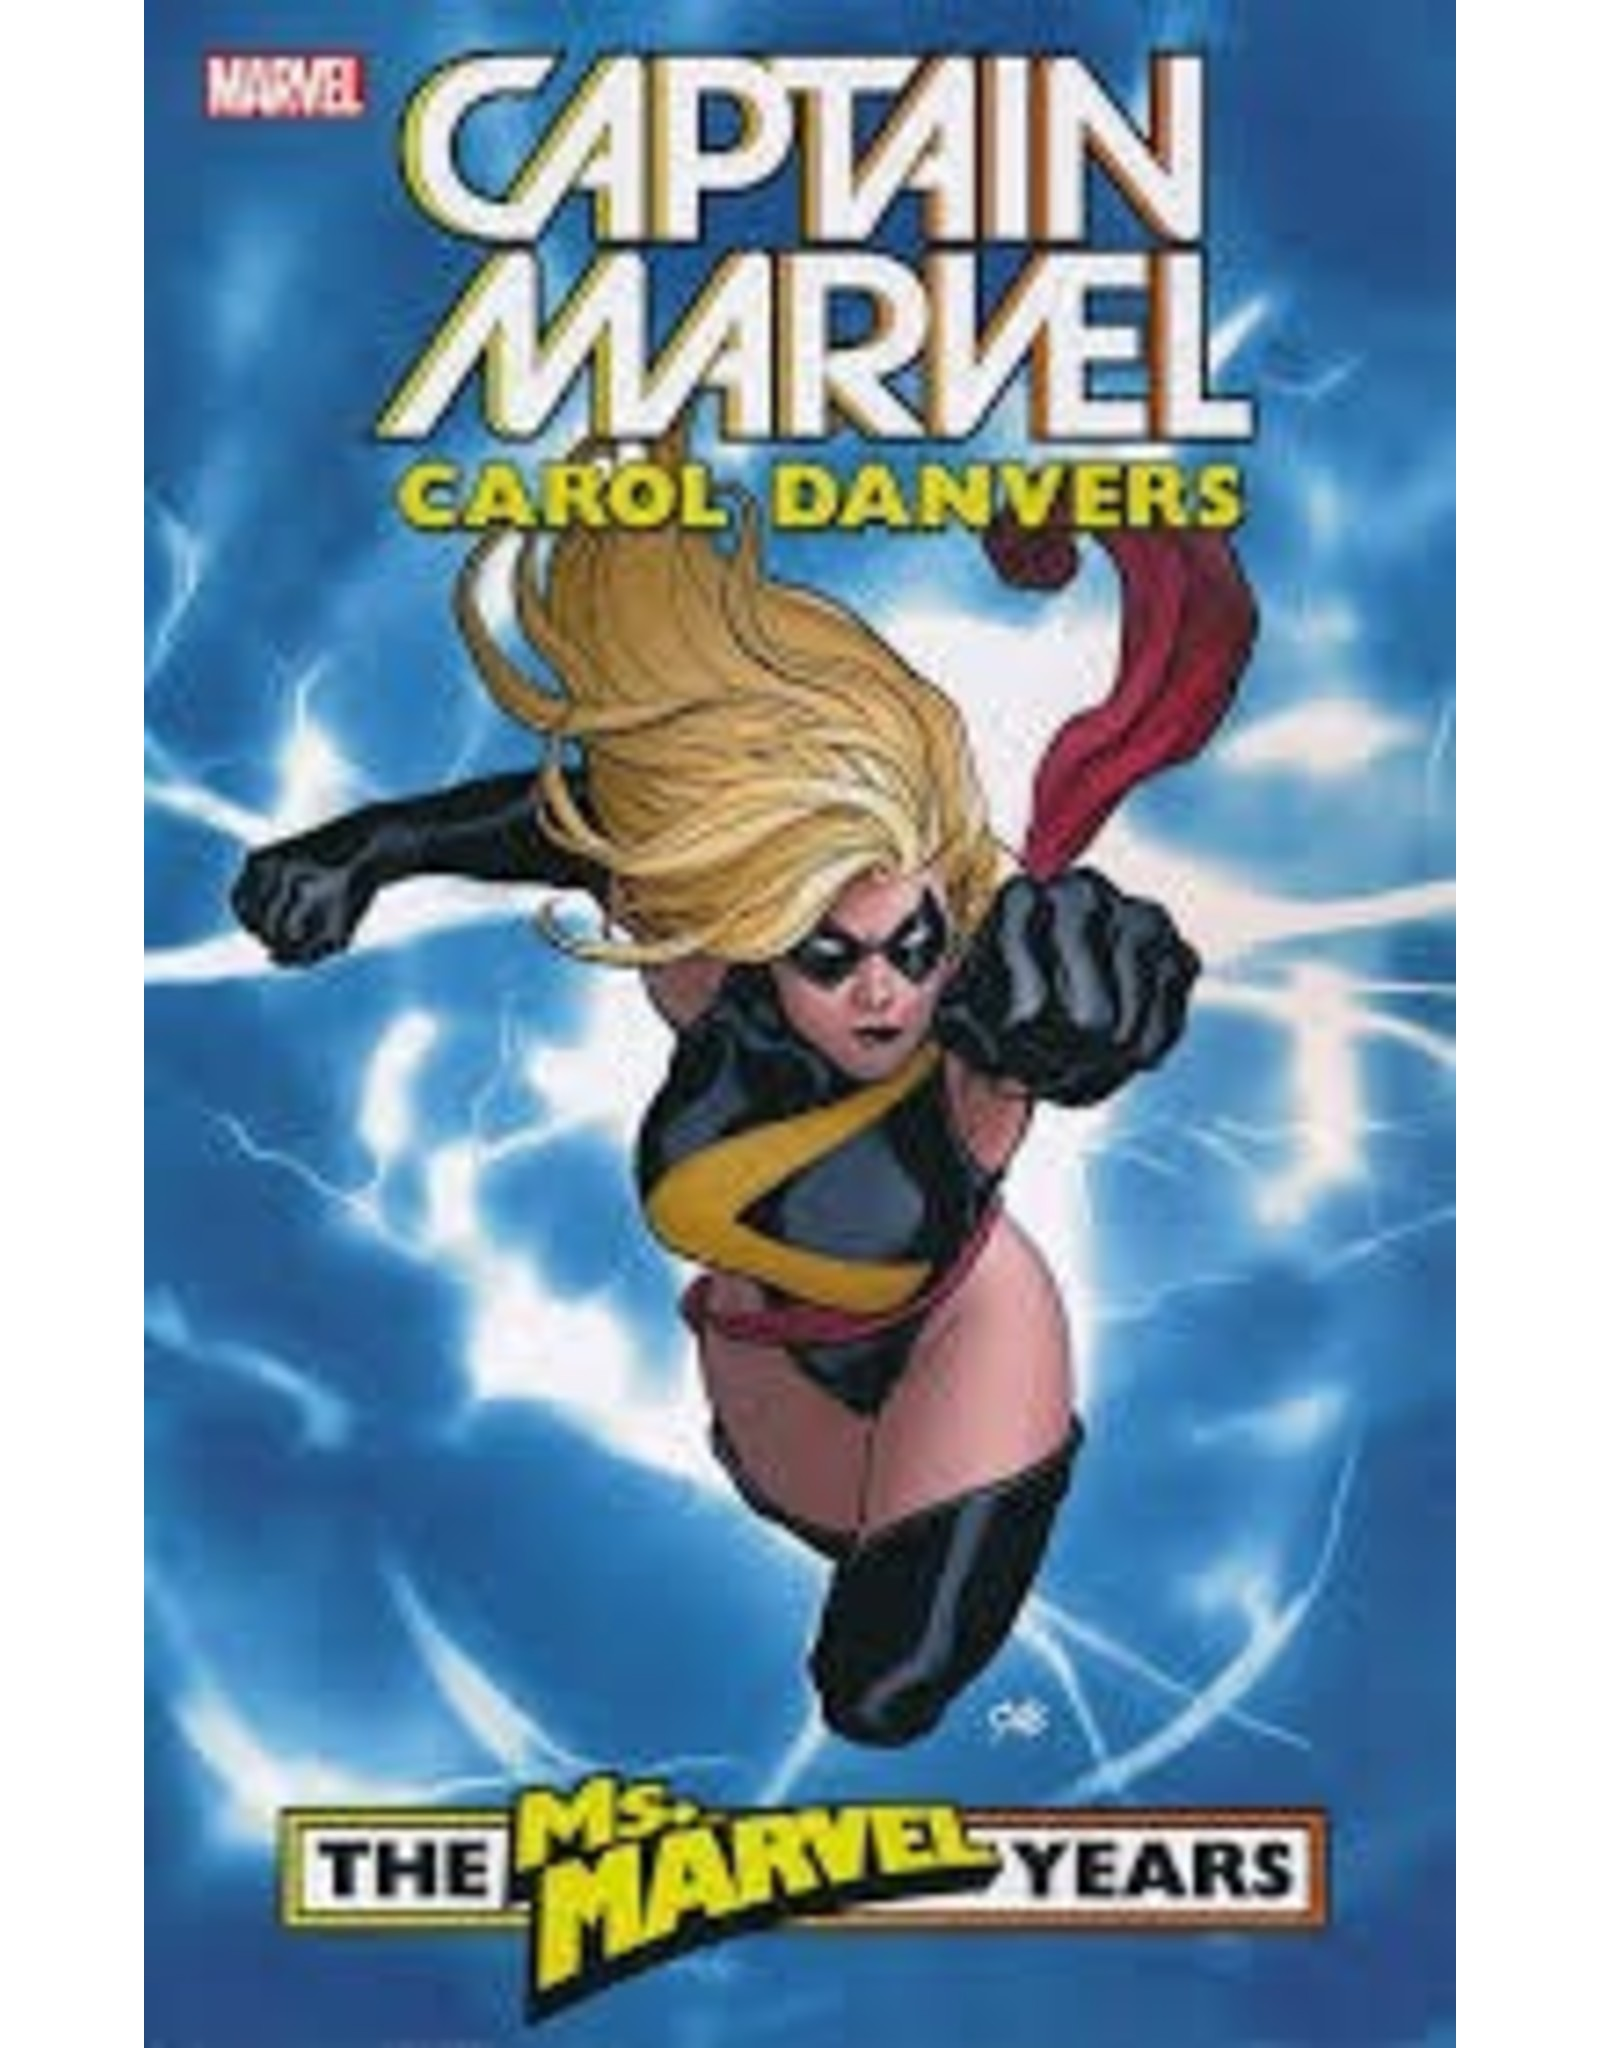 MARVEL COMICS CAPTAIN MARVEL CAROL DANVERS TP VOL 01 MS MARVEL YEARS